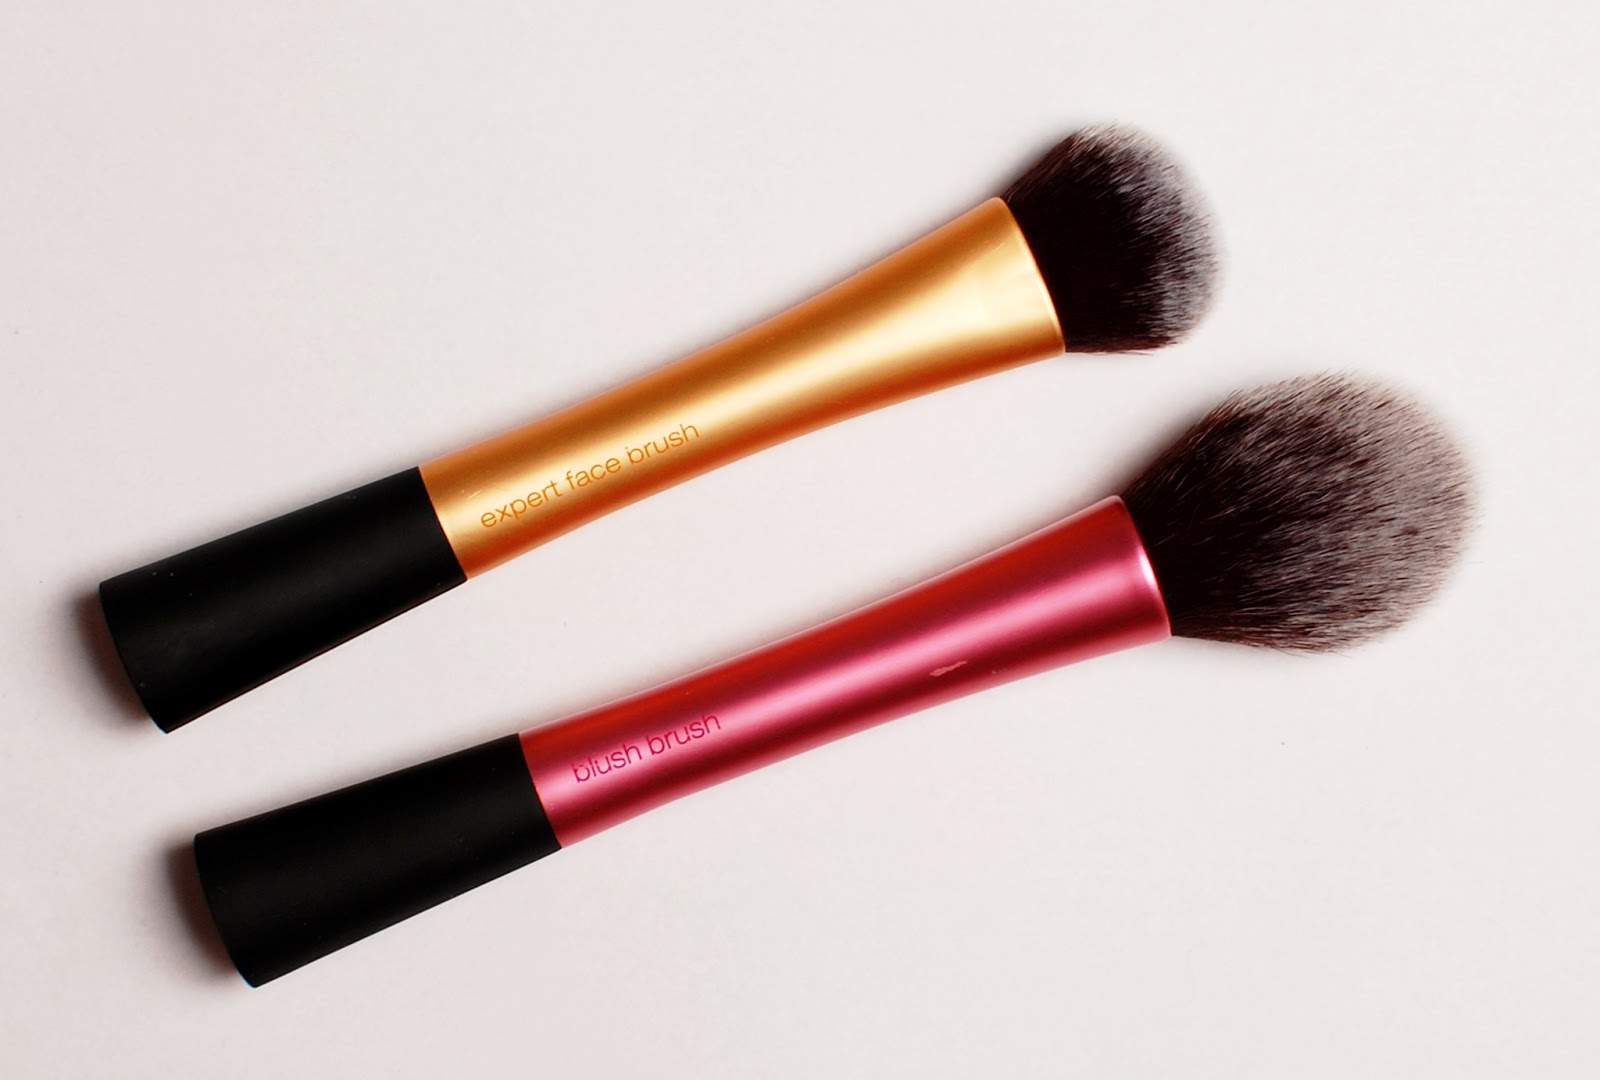 Real Techniques Expert Face Brush, Blush Brush